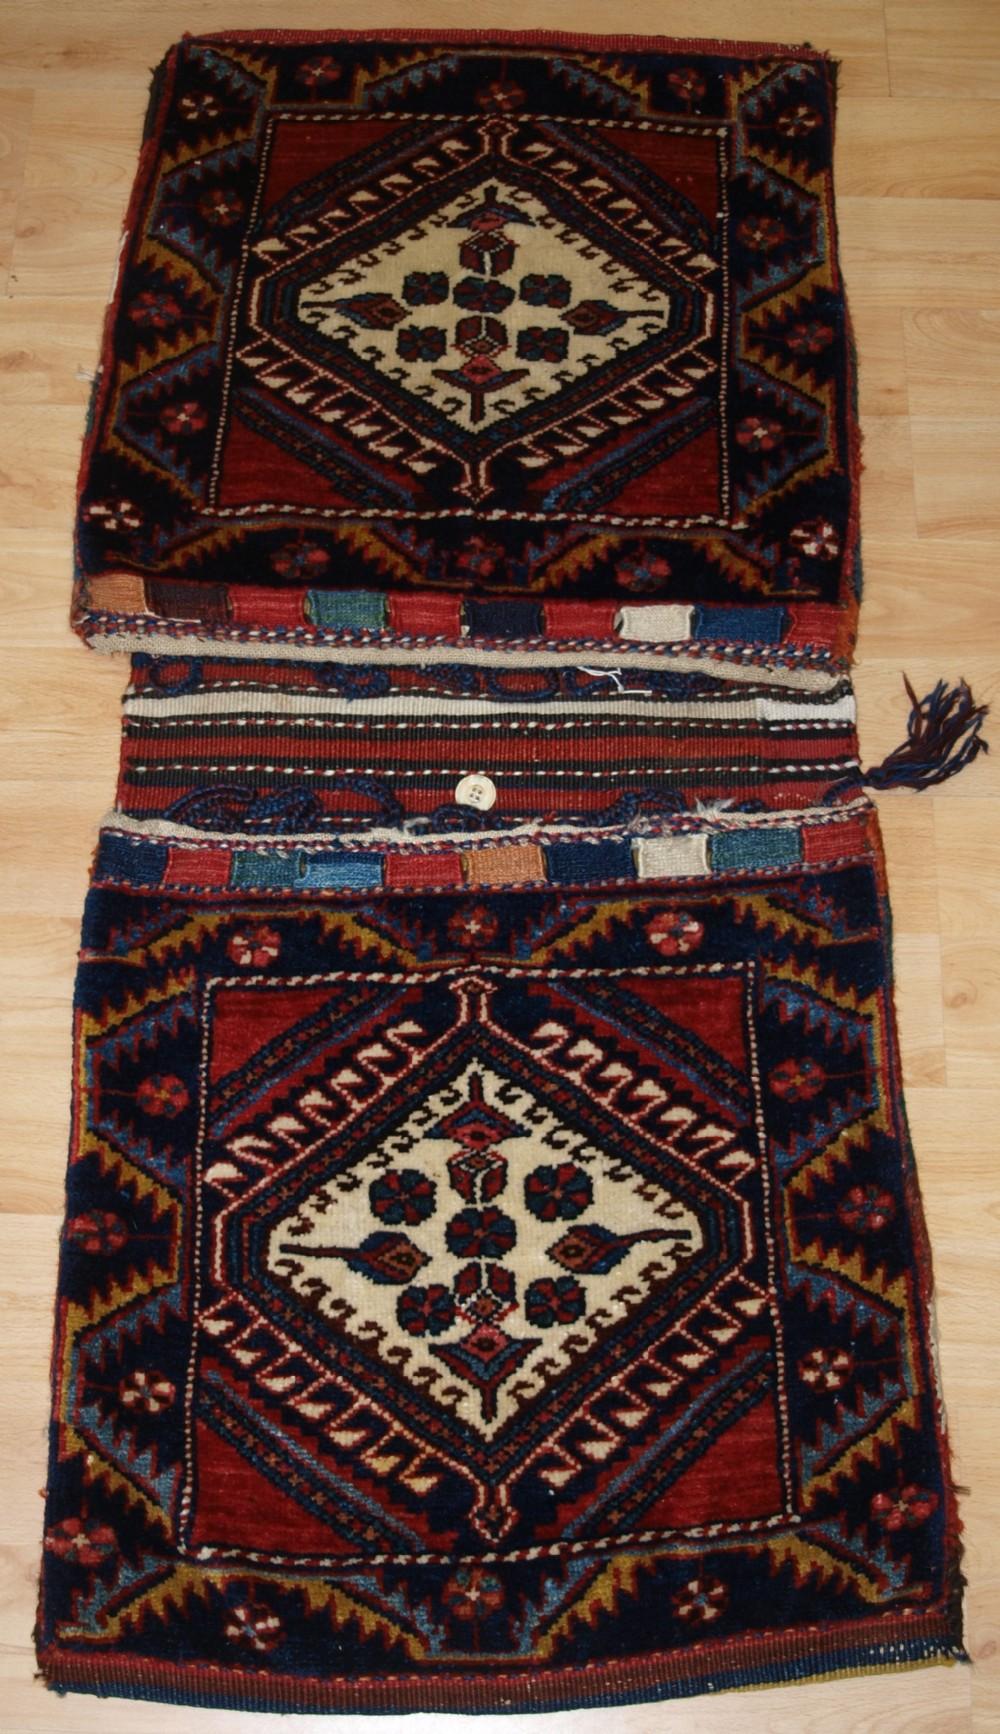 antique complete luri fars region khorjin saddle bags with plain weave back circa 190020